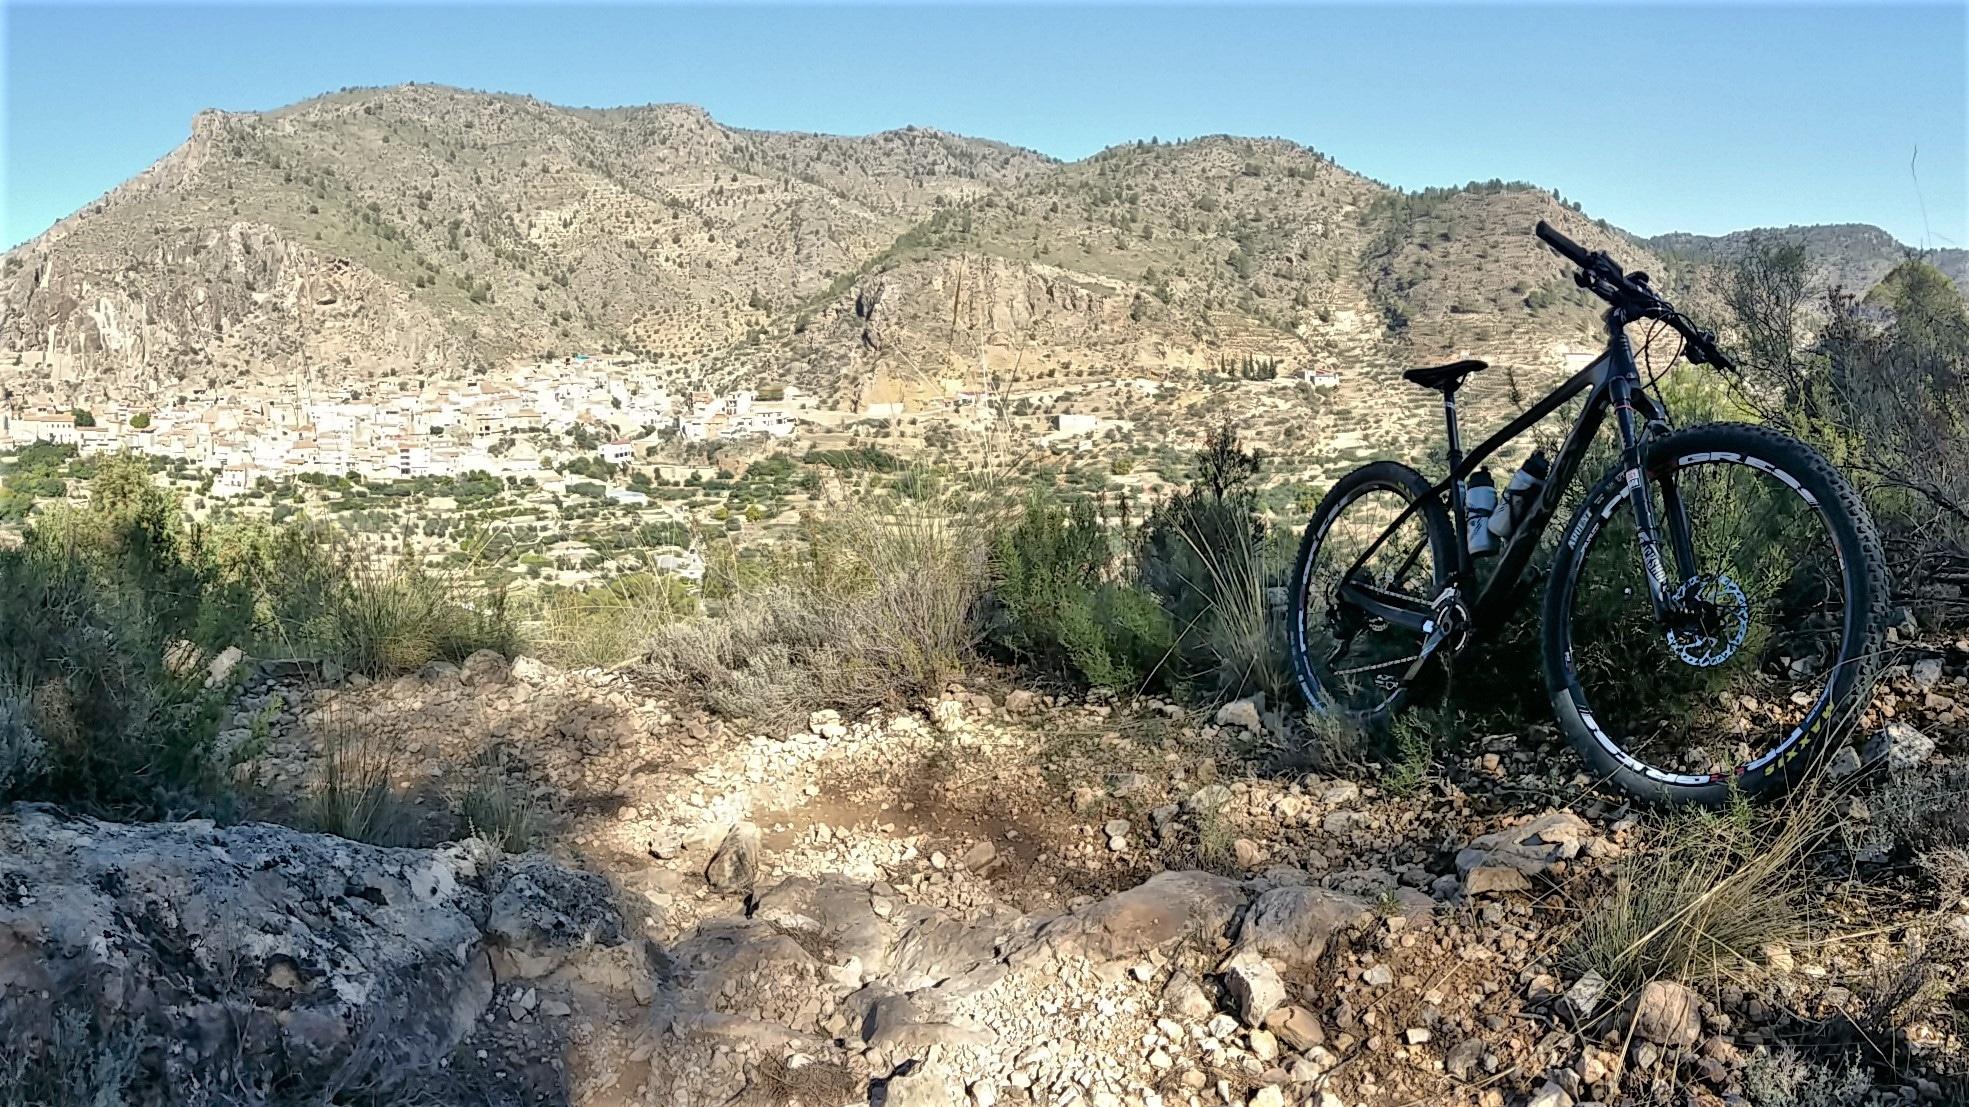 Rutas de BTT en Aýna - Sierra del Segura